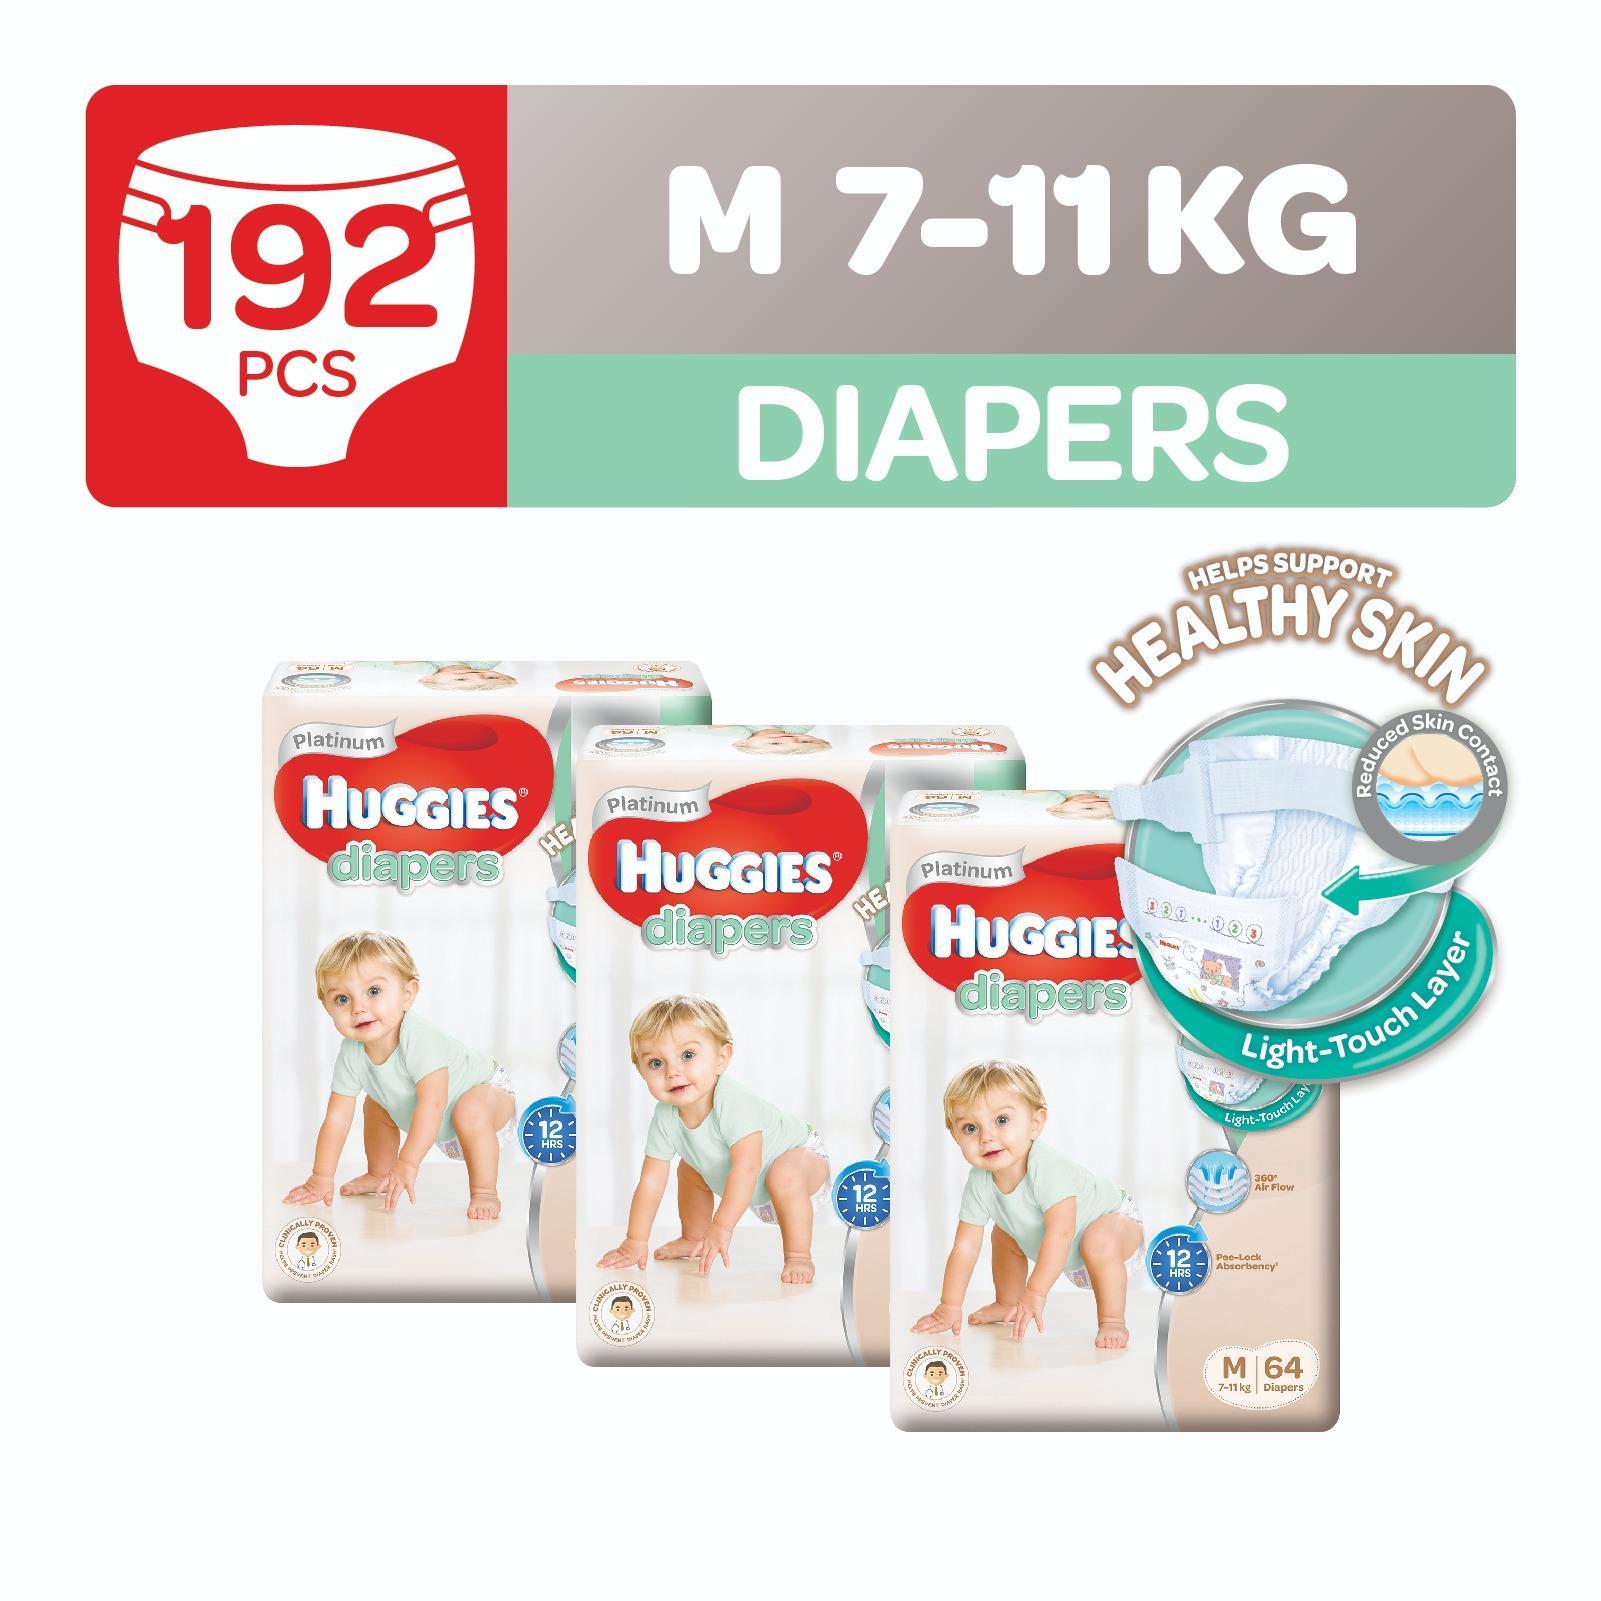 Retail Price Huggies Platinum Diapers M 64Pcs X 3 Packs